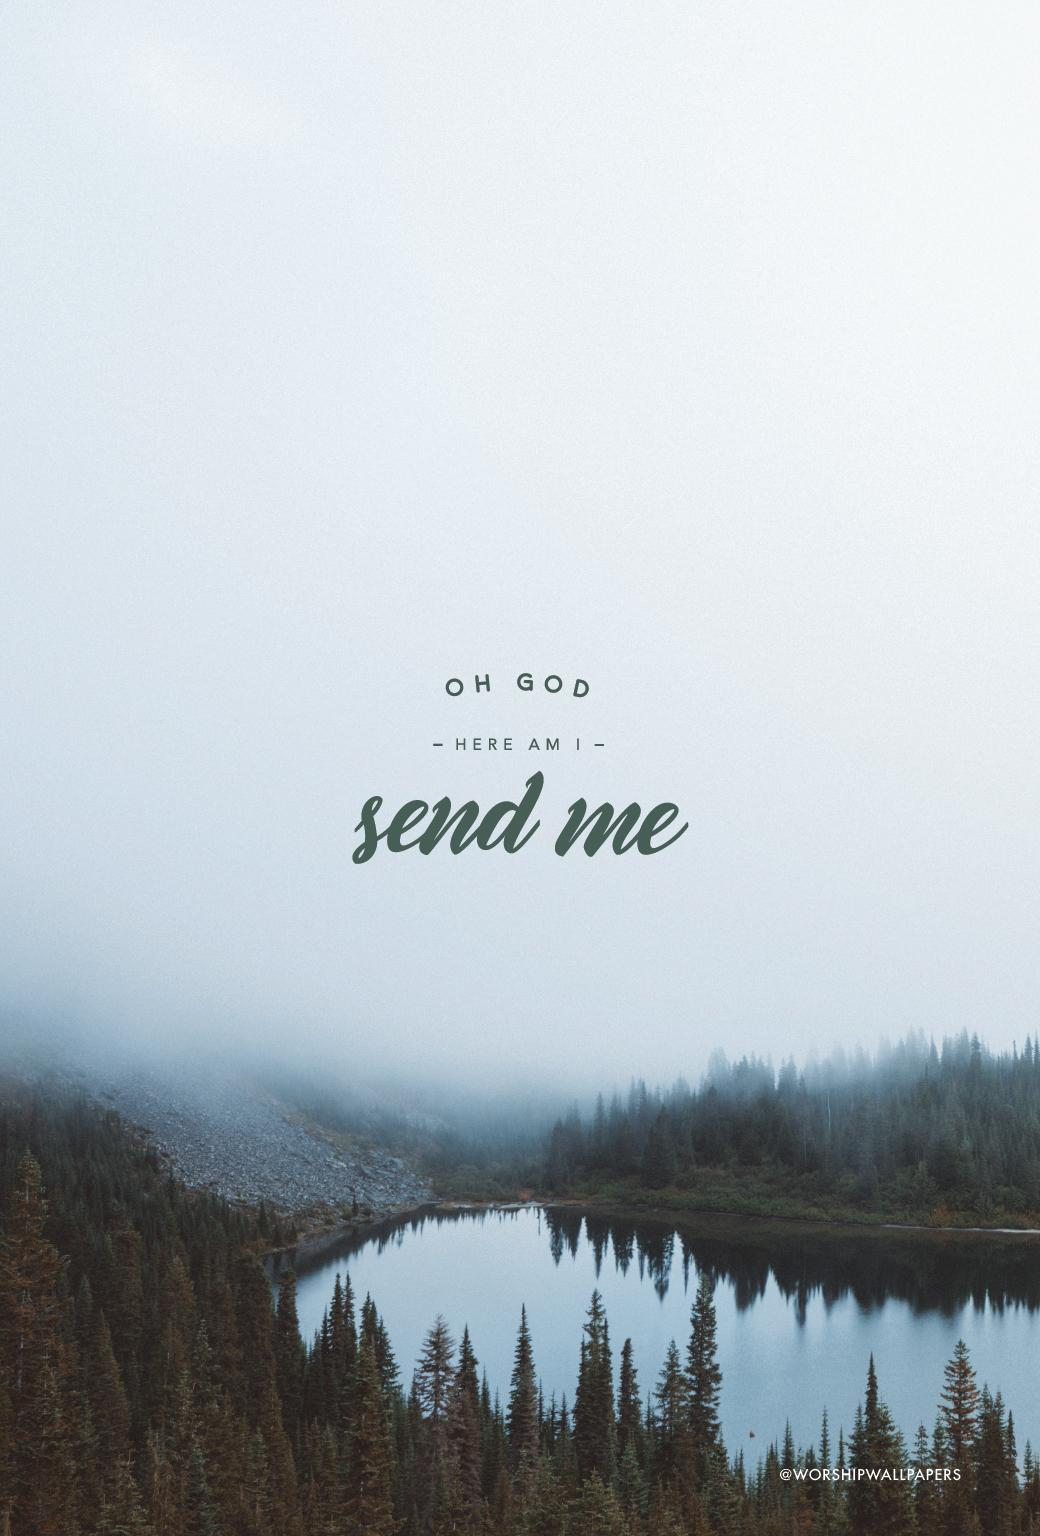 isaiah-6-here-am-i-send-me-phone